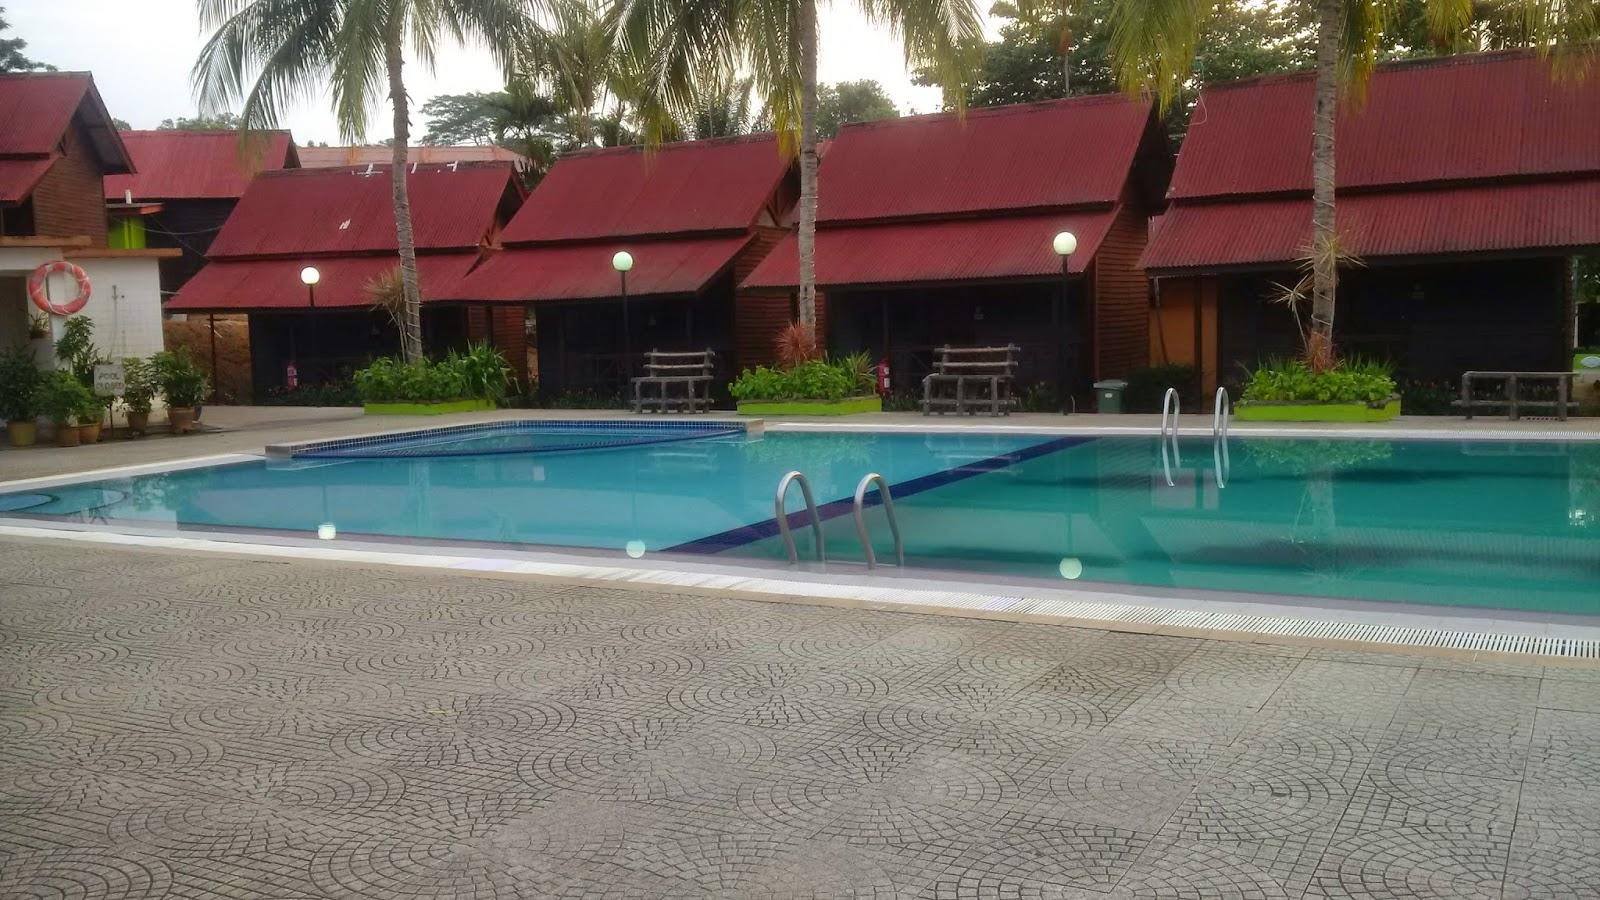 d'village resort melaka, melaka hotels, hotels, oo Melaka, Taman Bunga Seribu, Mcd, Taman Botanical, Taman Crocodile, Bee Gallery,